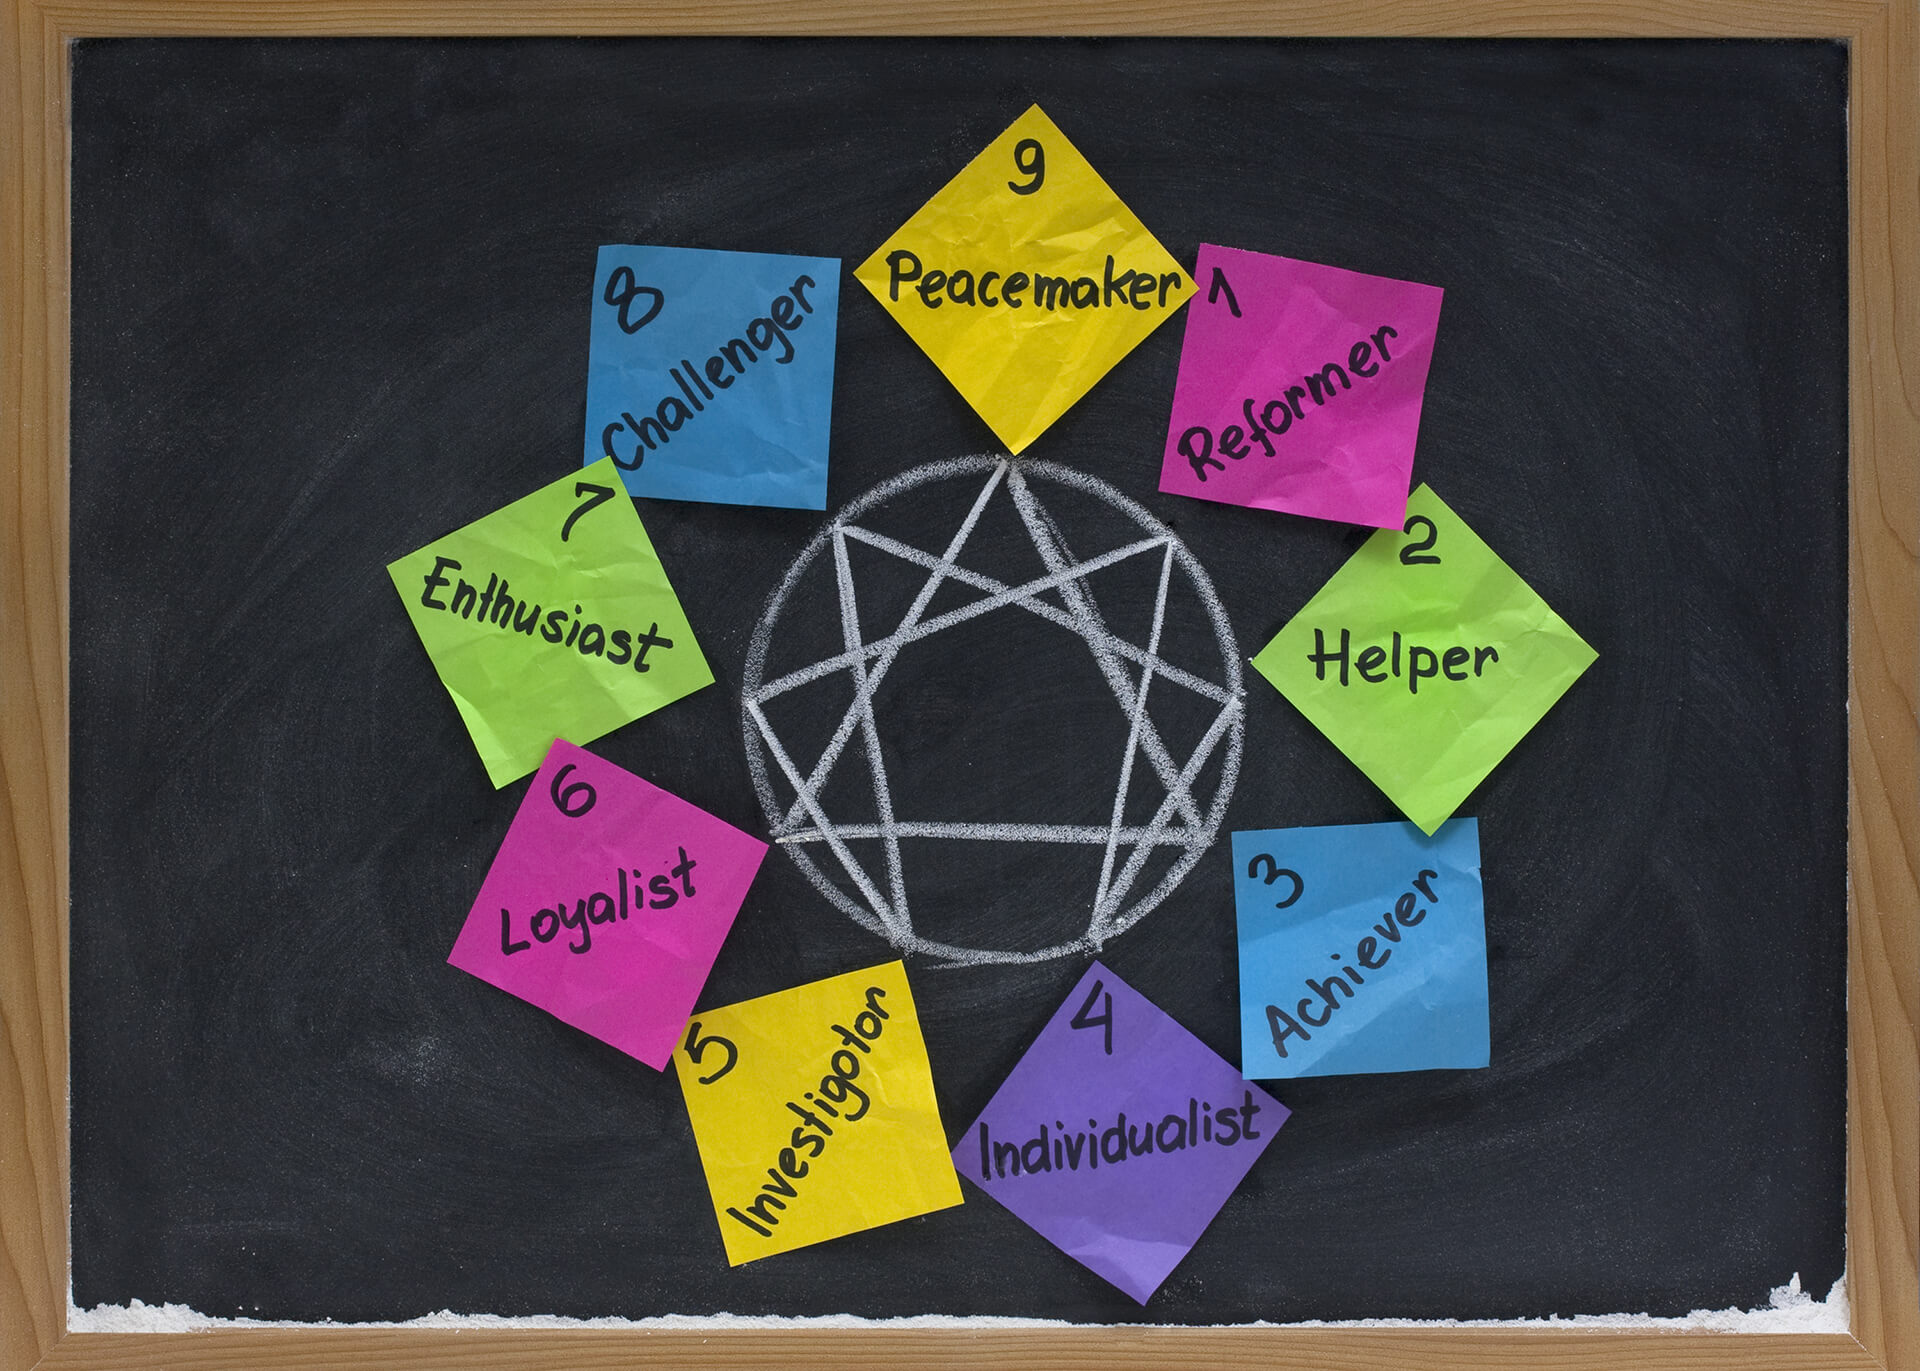 enneagram compatibility chart